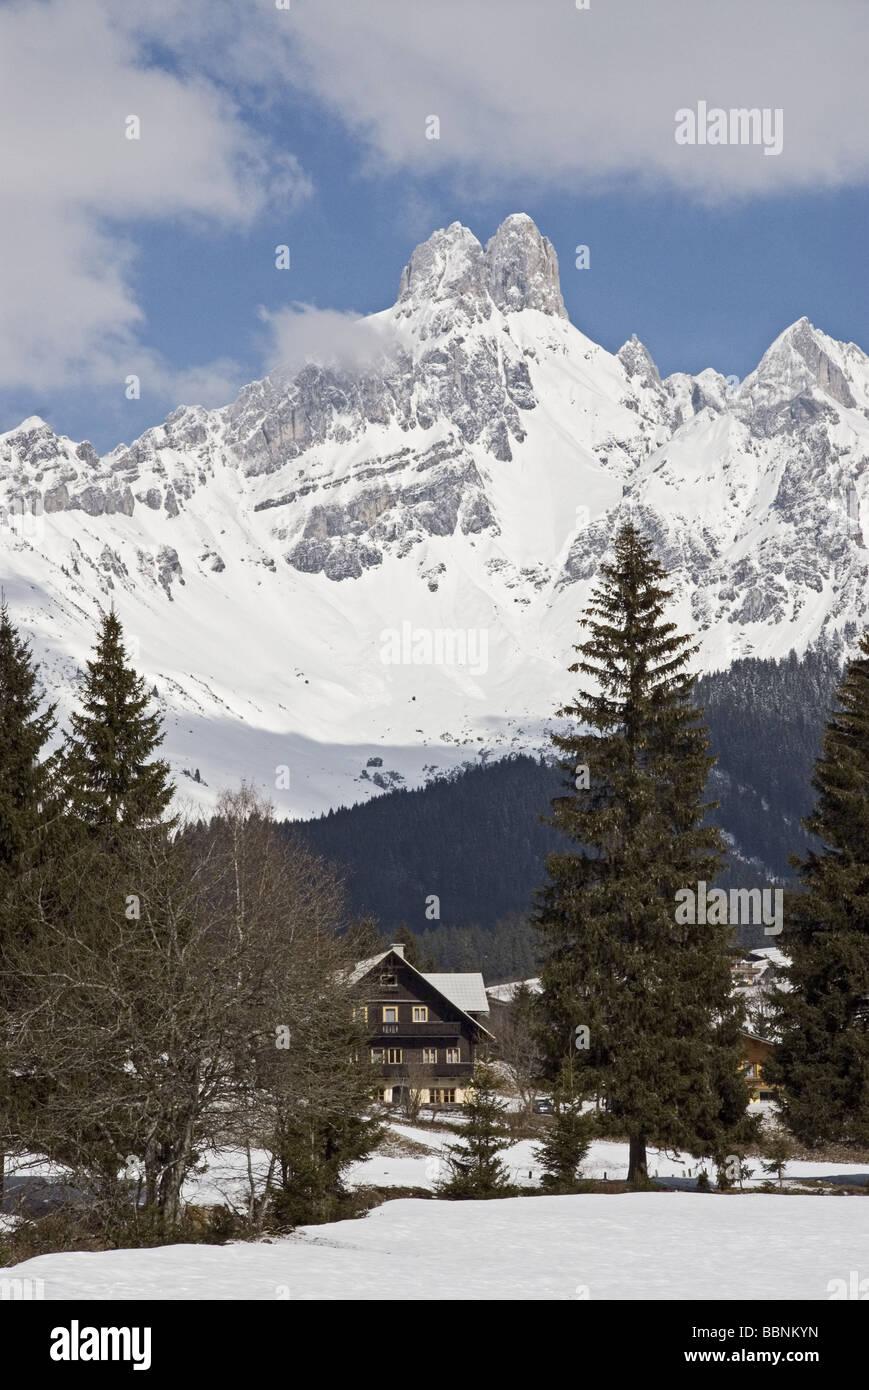 Geografía / viajes, Austria, Salzburgo, paisajes, Estado Bischofsmütze (2459 m), Additional-Rights-Clearance Imagen De Stock